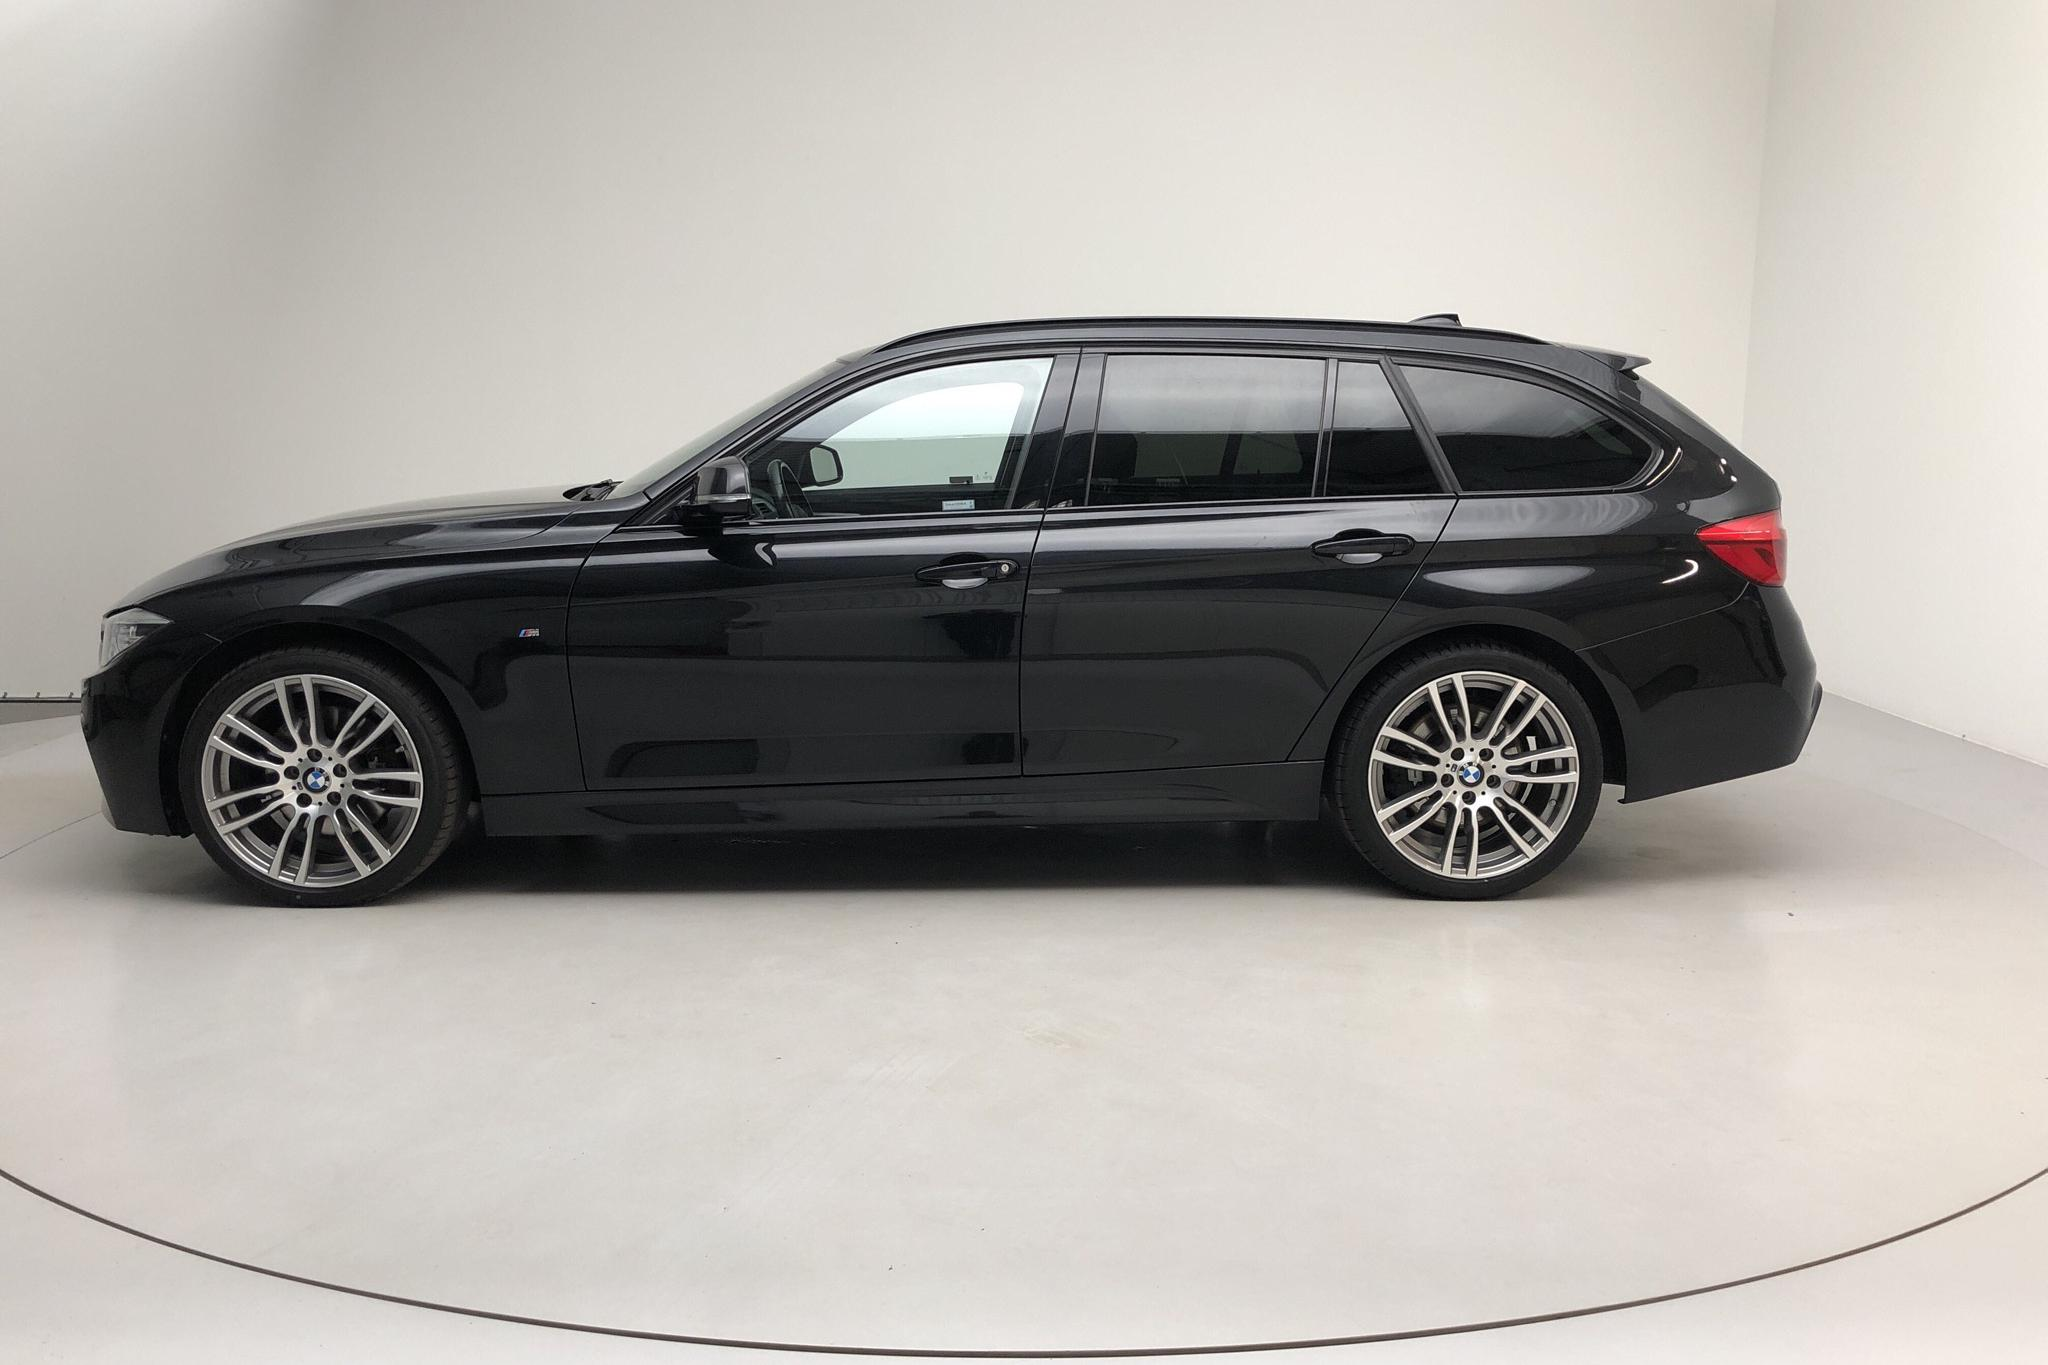 BMW 330d xDrive Touring, F31 (258hk) - 6 385 mil - Automat - svart - 2016